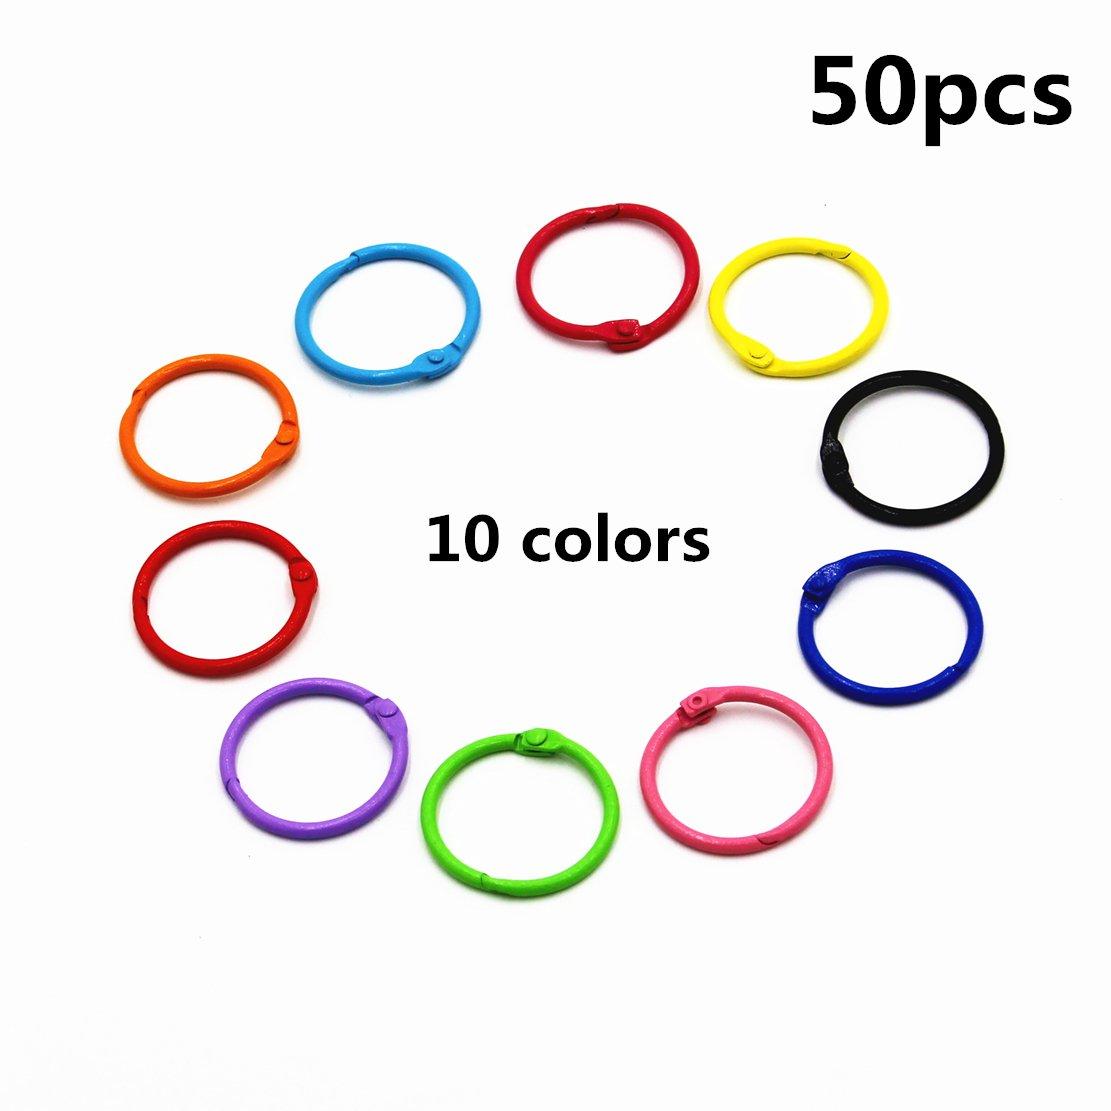 Colored Loose Leaf Binder Rings Metal Book Rings 1 Inch, Multicolor, 50 Pieces